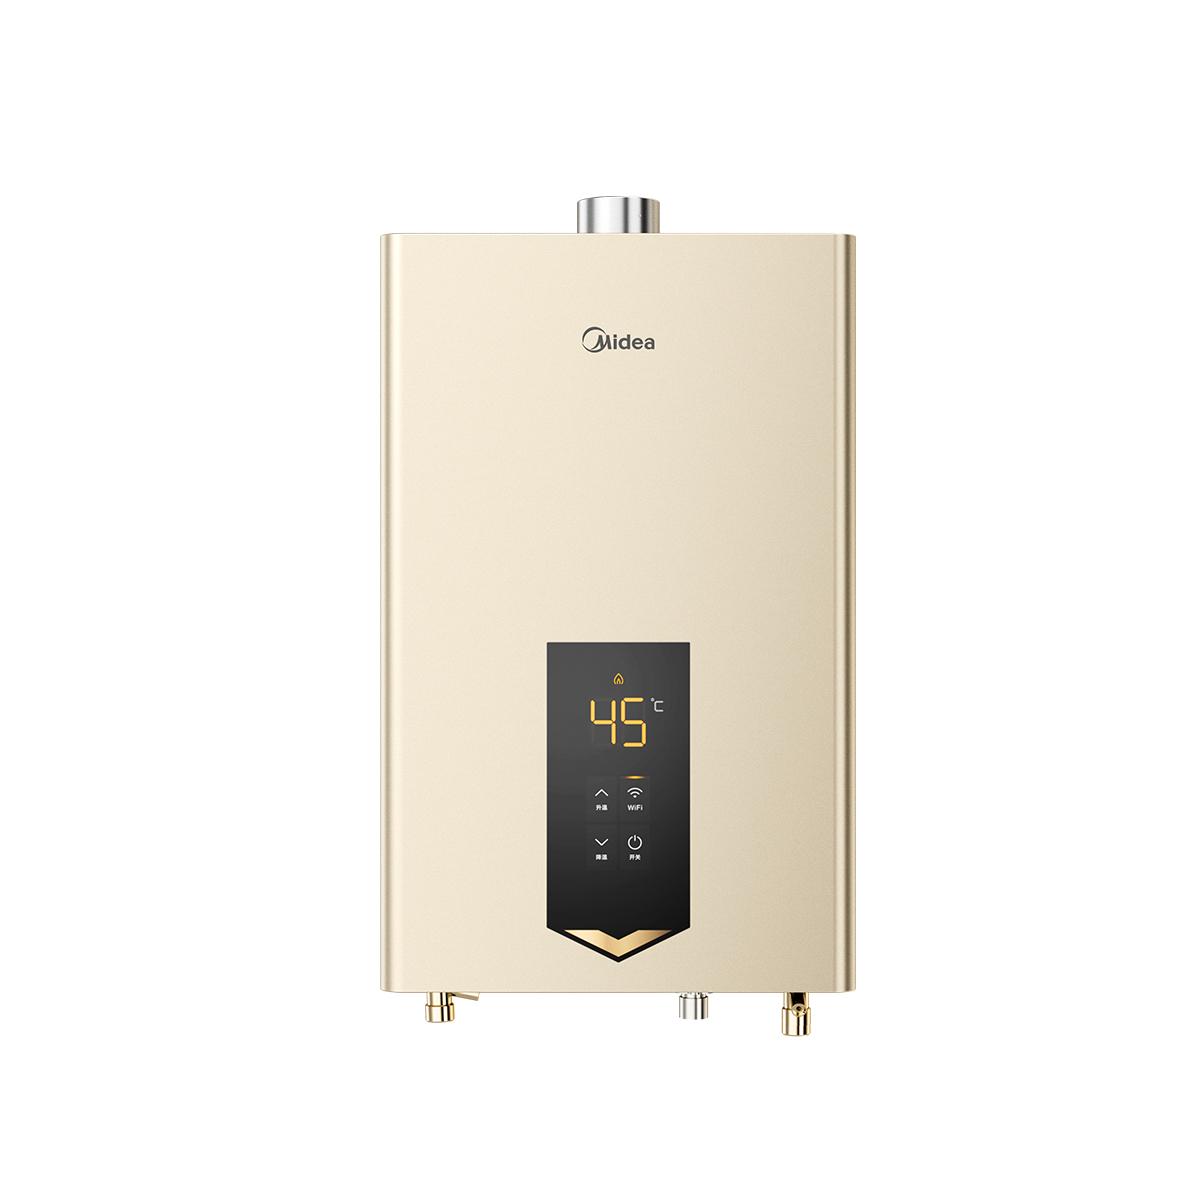 Midea/美的 JSQ25-TD1燃气热水器 说明书.pdf